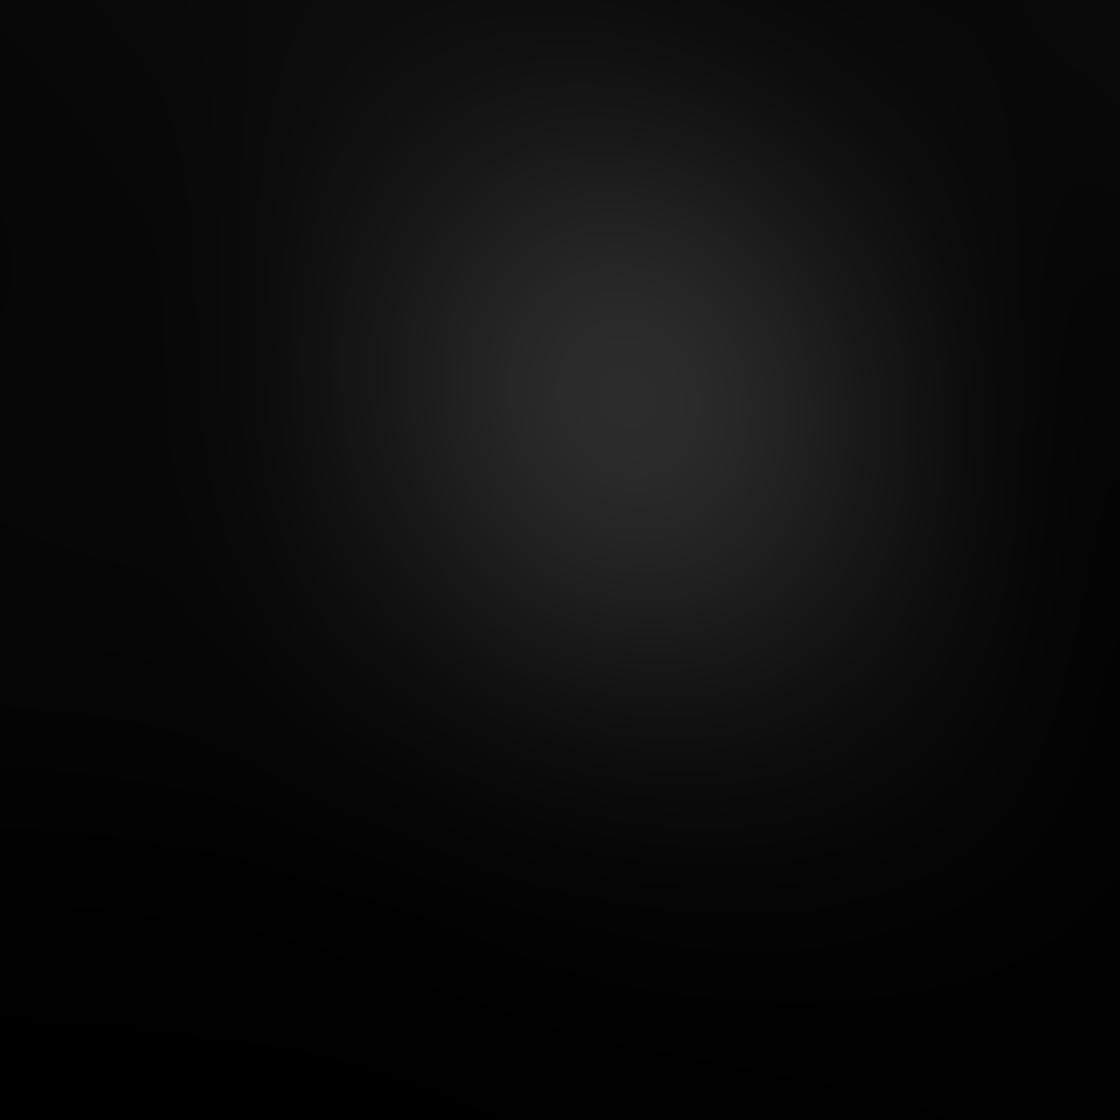 iPhone Photo Black White 19